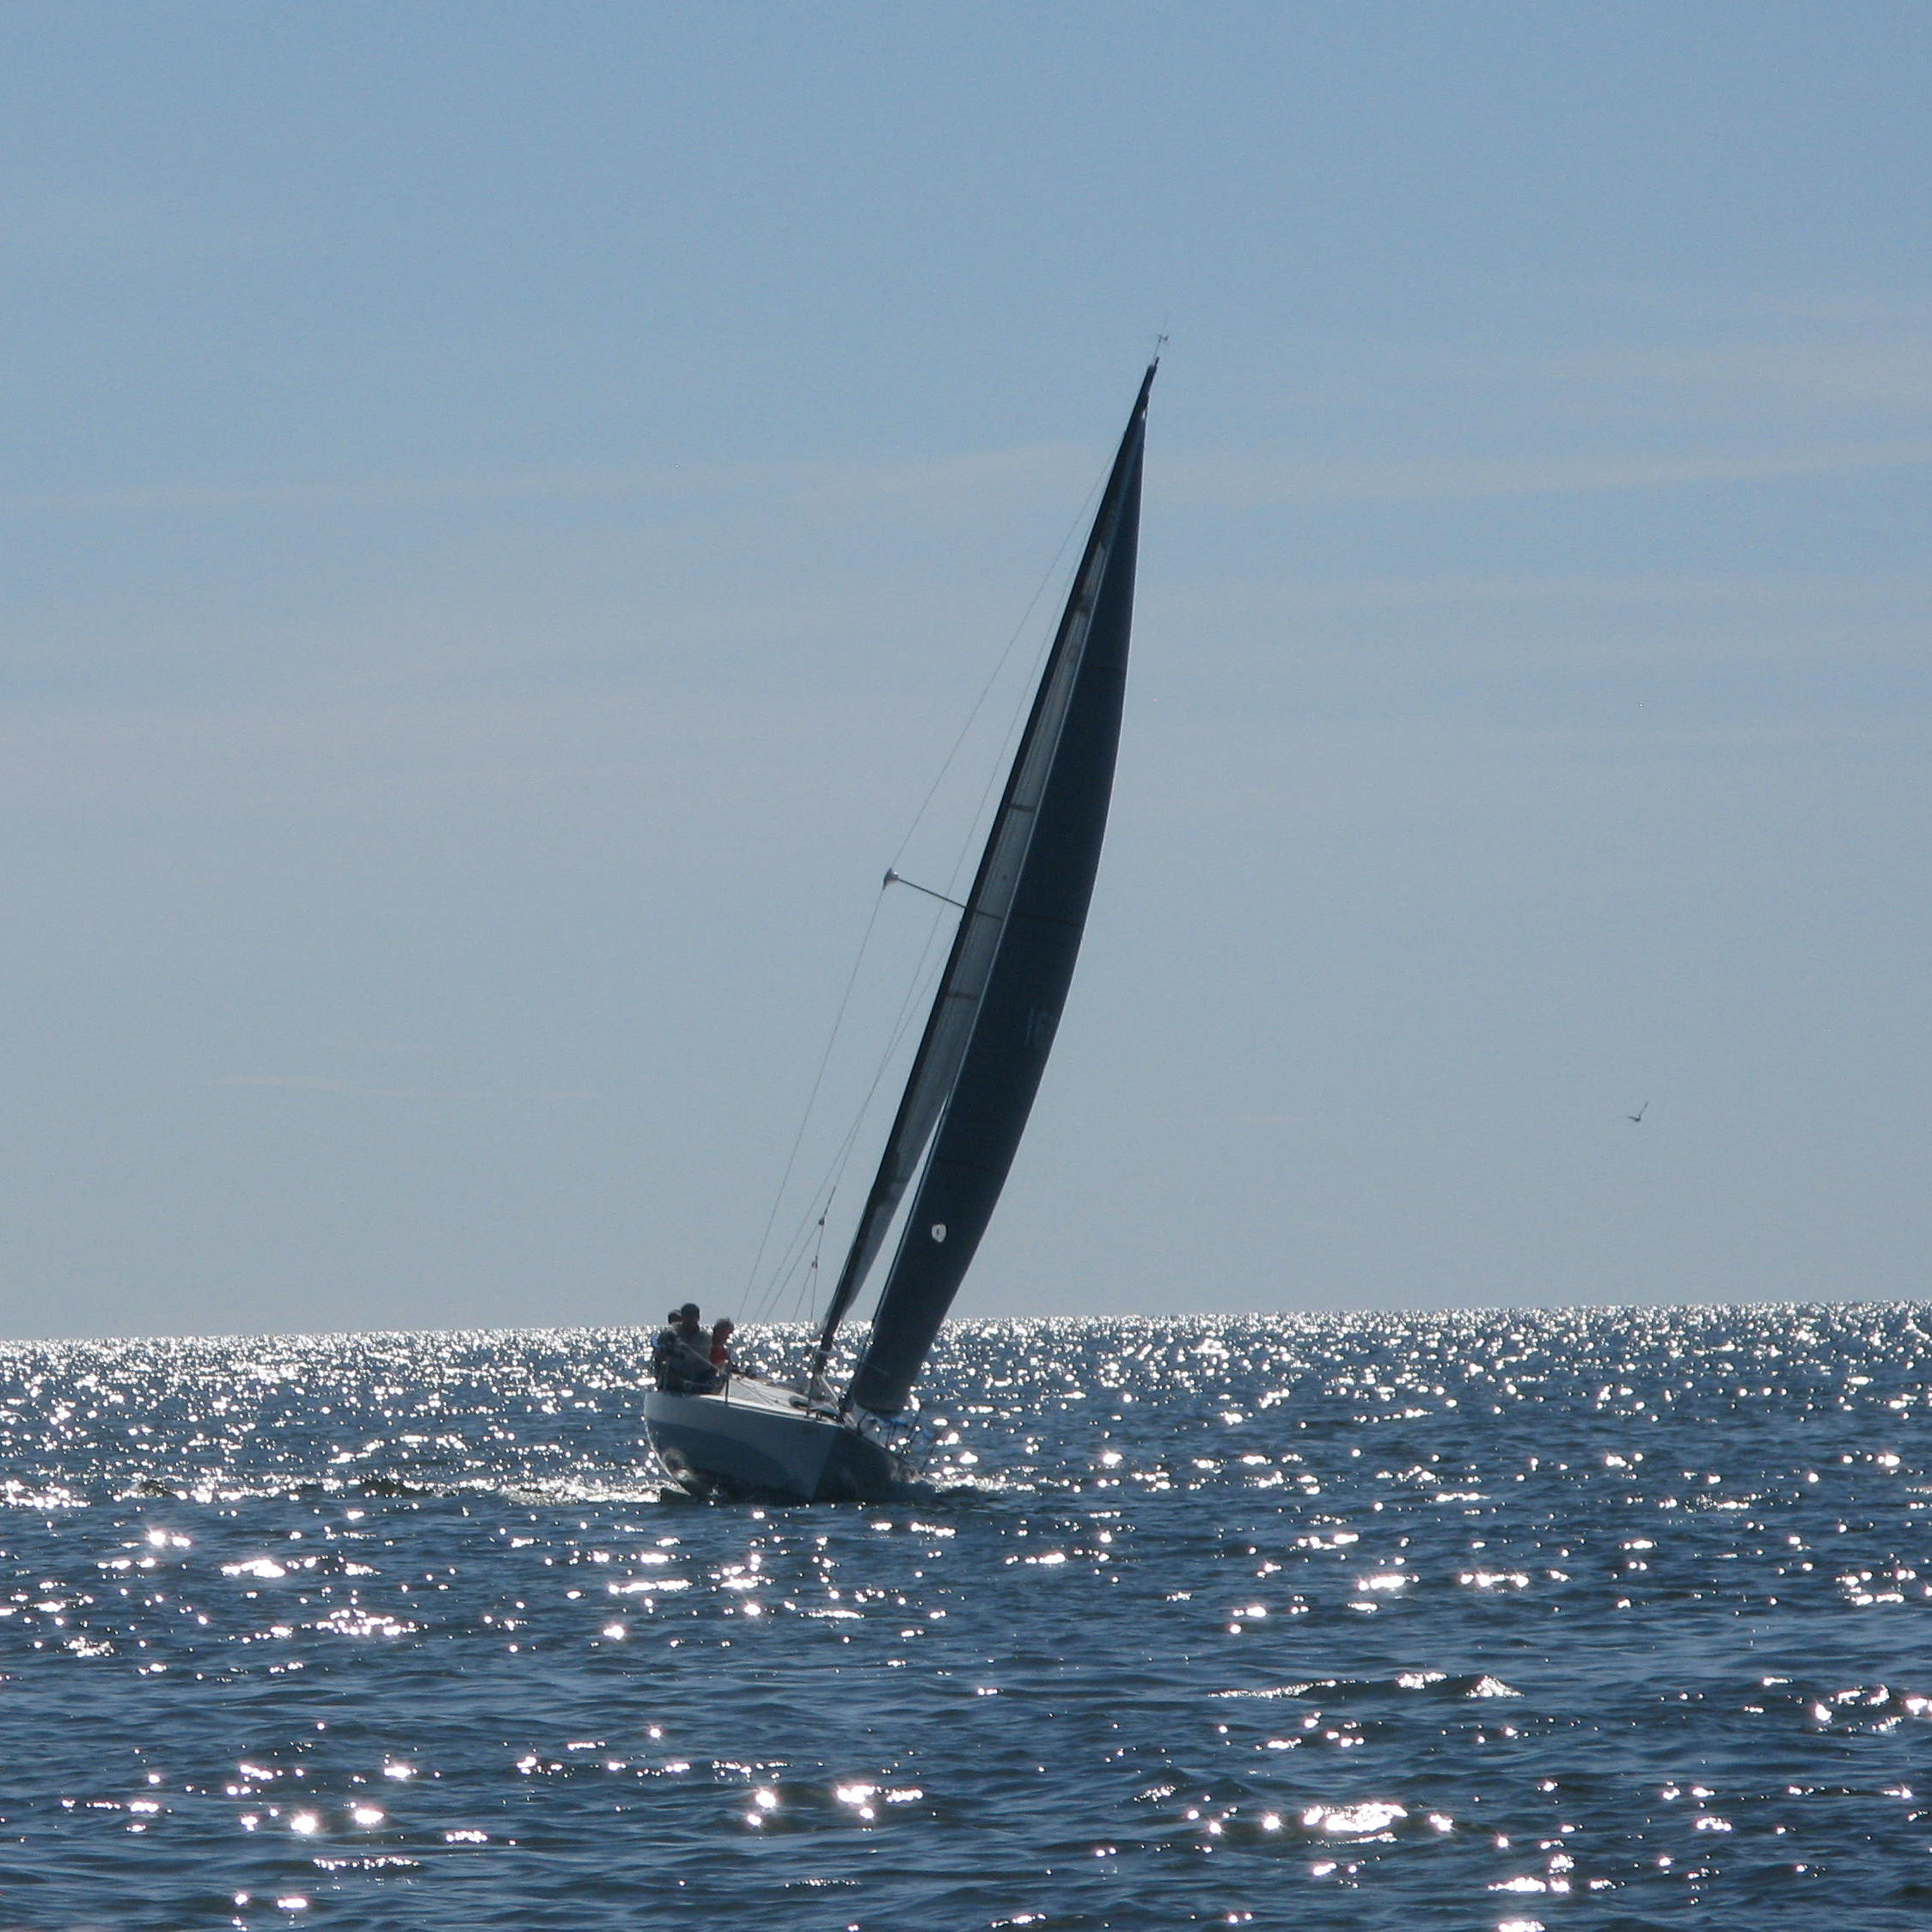 Olson 30 upwind